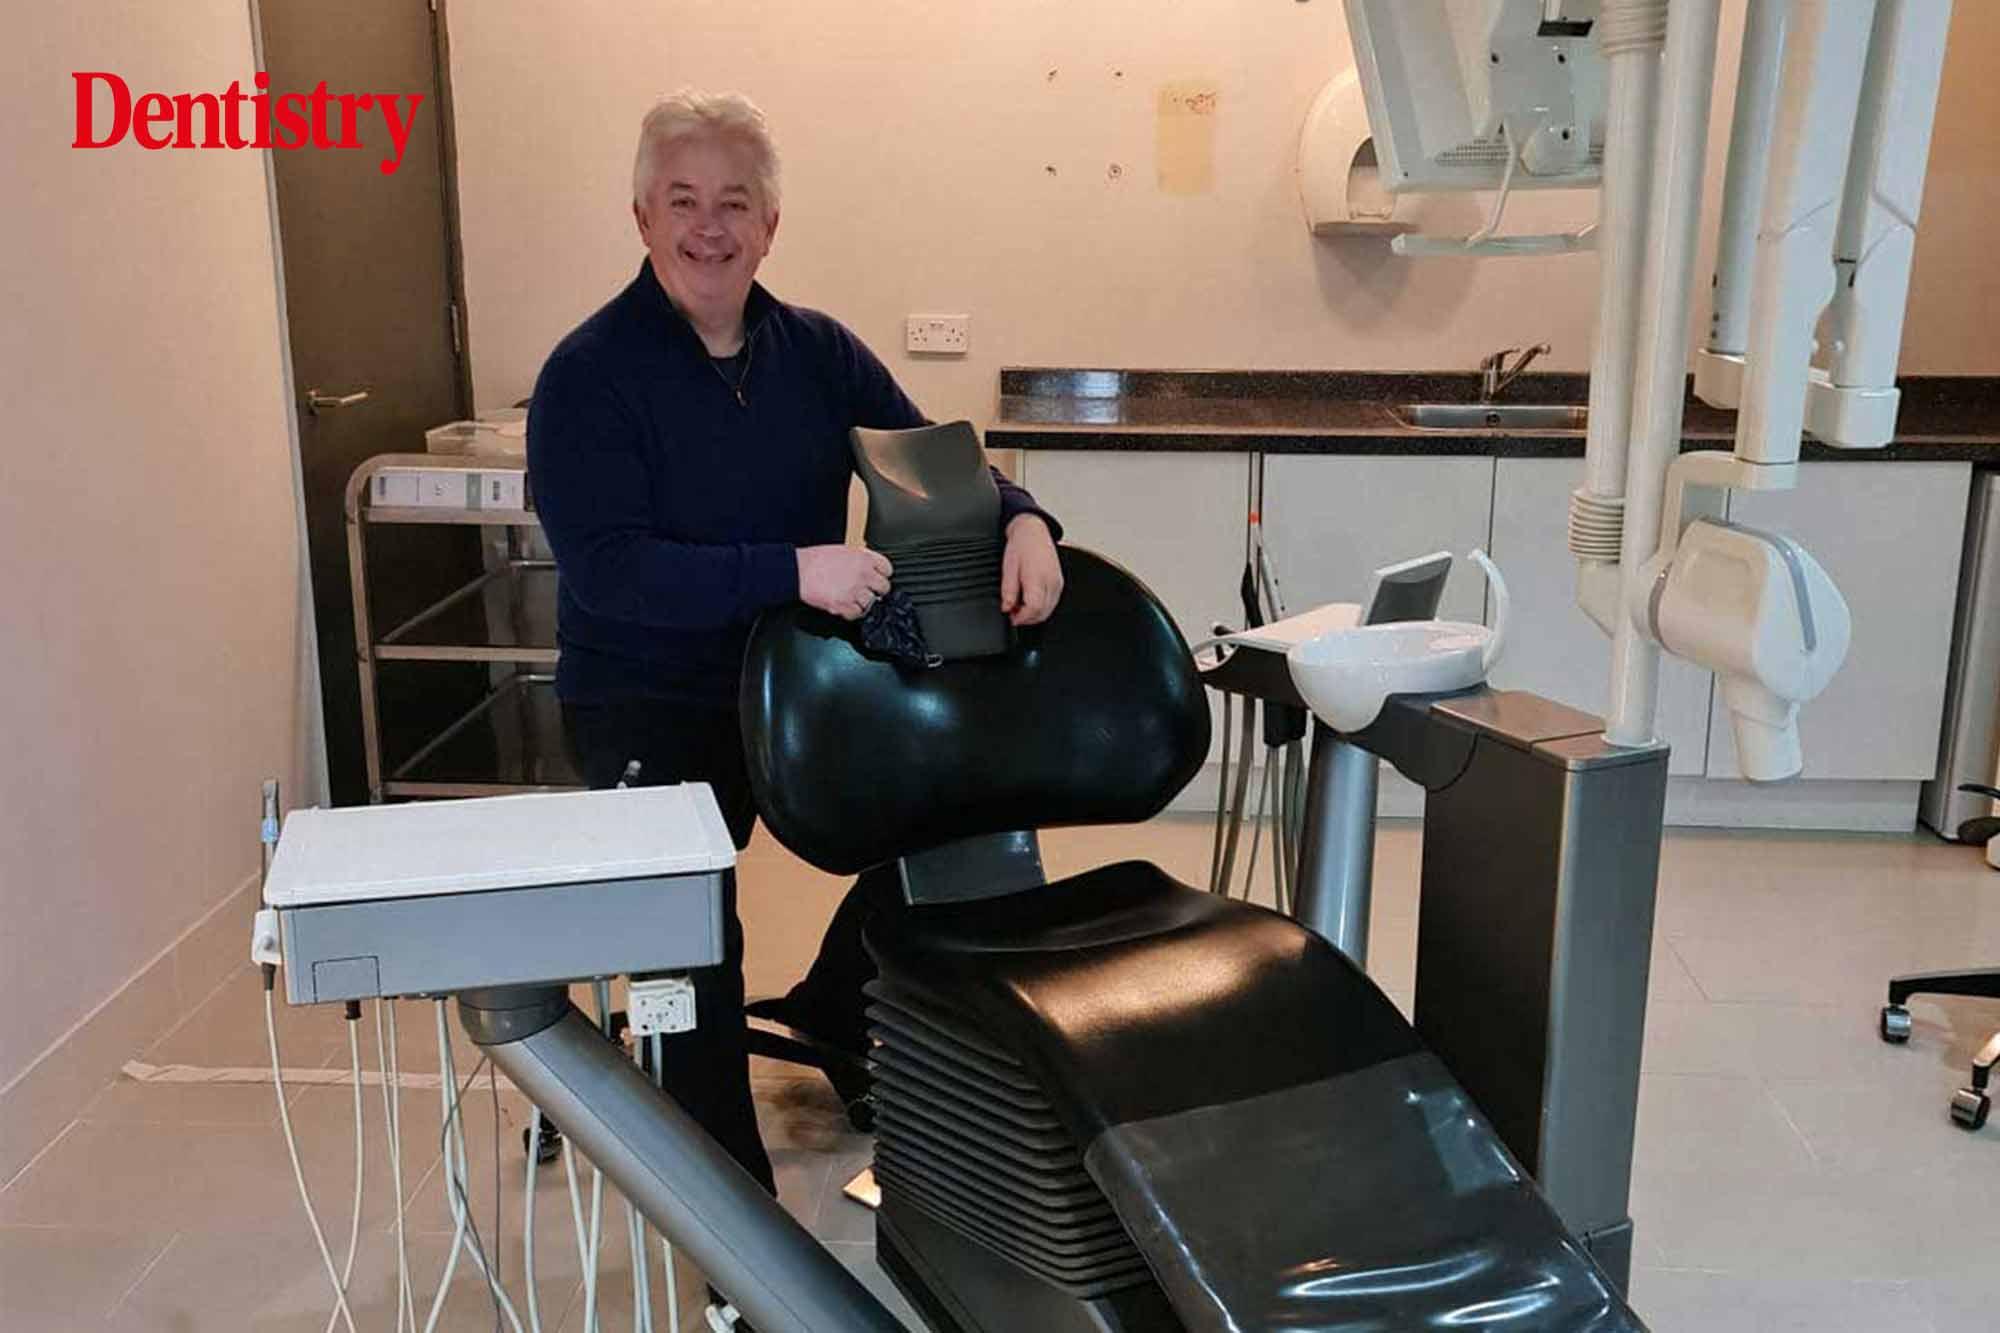 Dentist to auction dental equipment